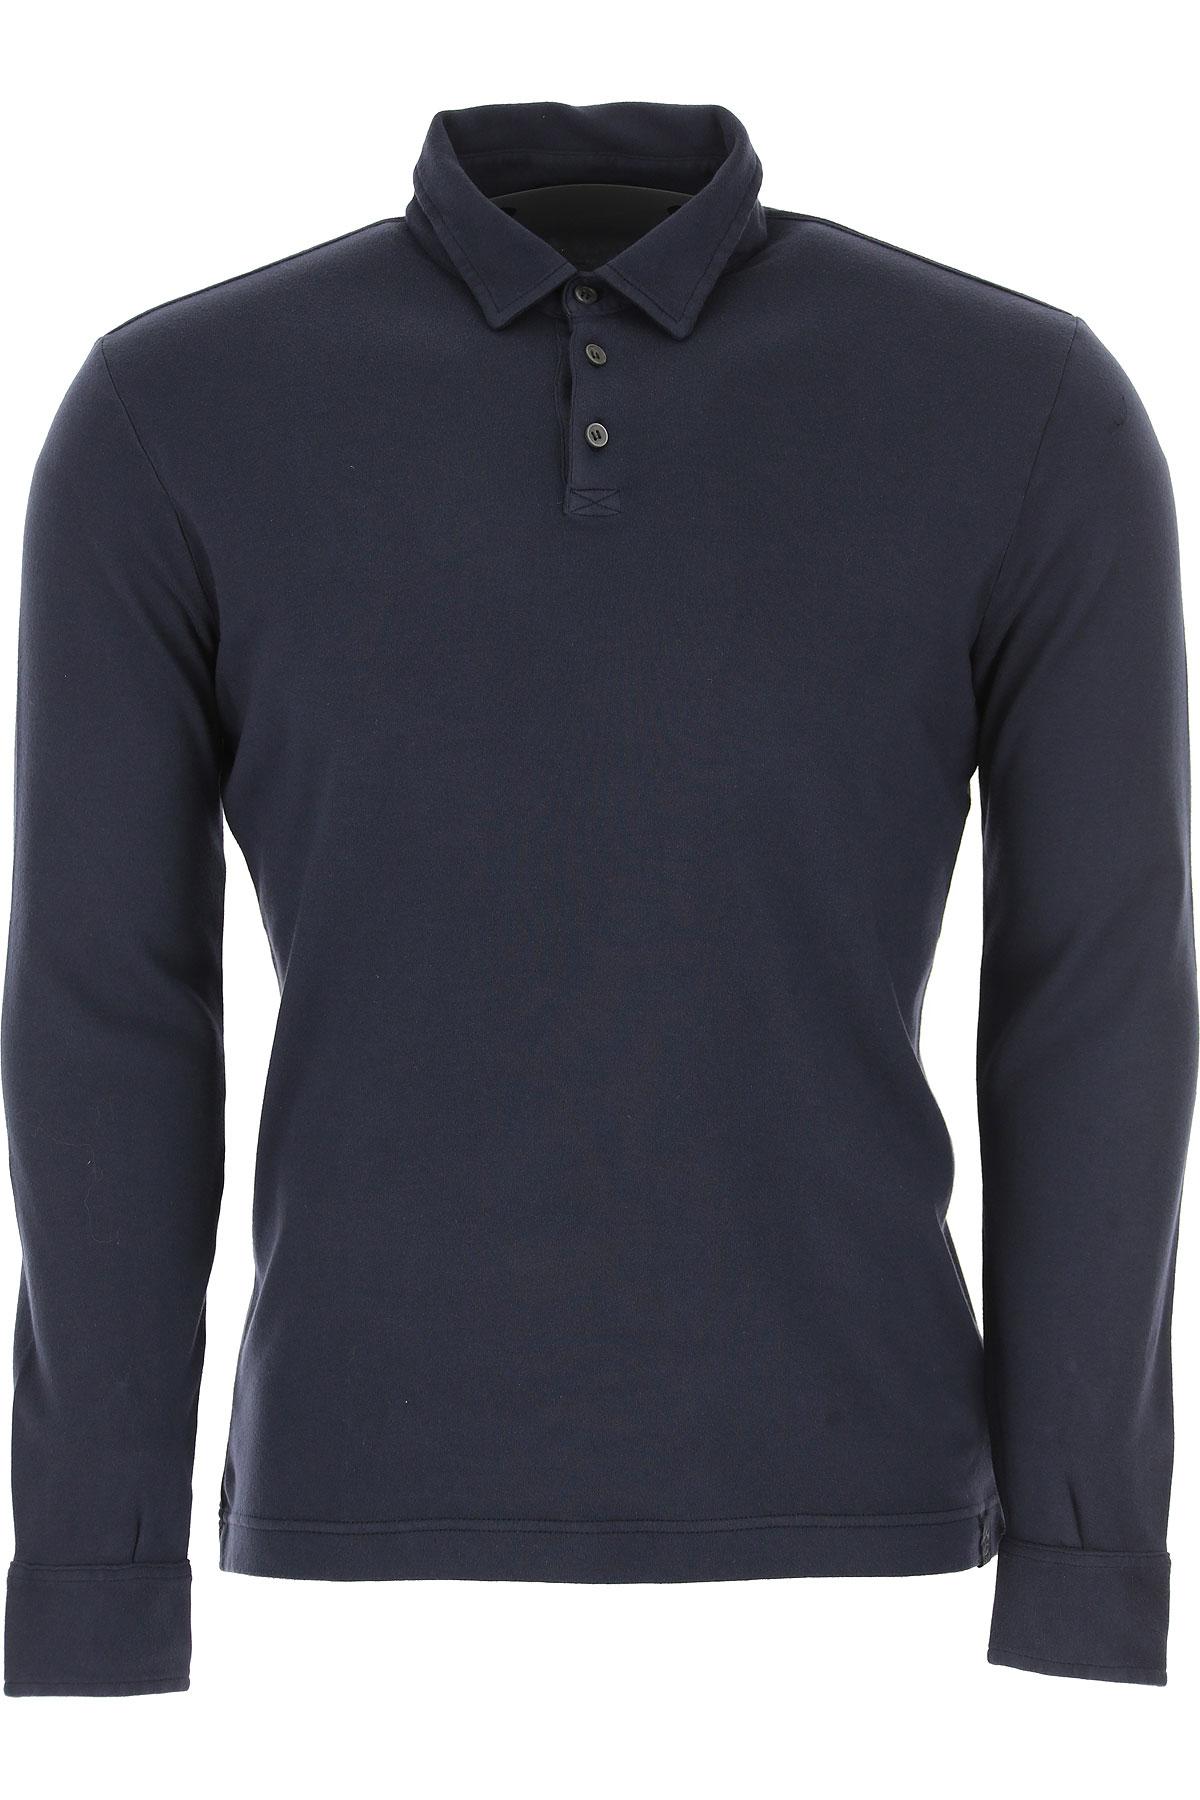 Image of Zanone Polo Shirt for Men, Dark Ocean Blue, Cotton, 2017, XL XXL XXXL